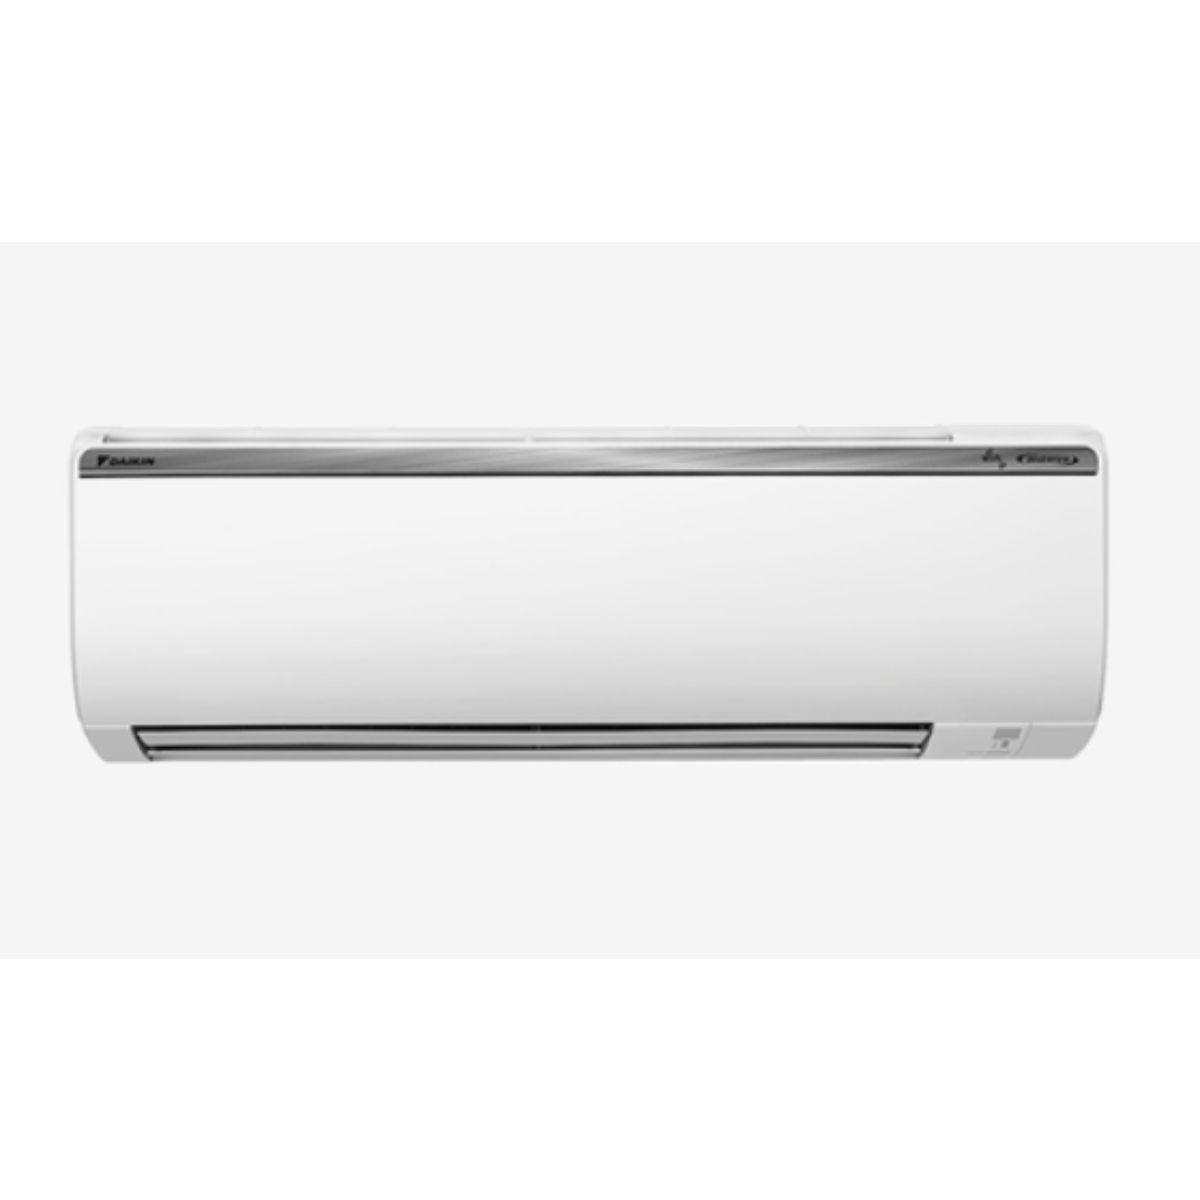 Daikin 1.8 Ton 5 Star Inverter Split Air Conditioner (FTKR60TV)